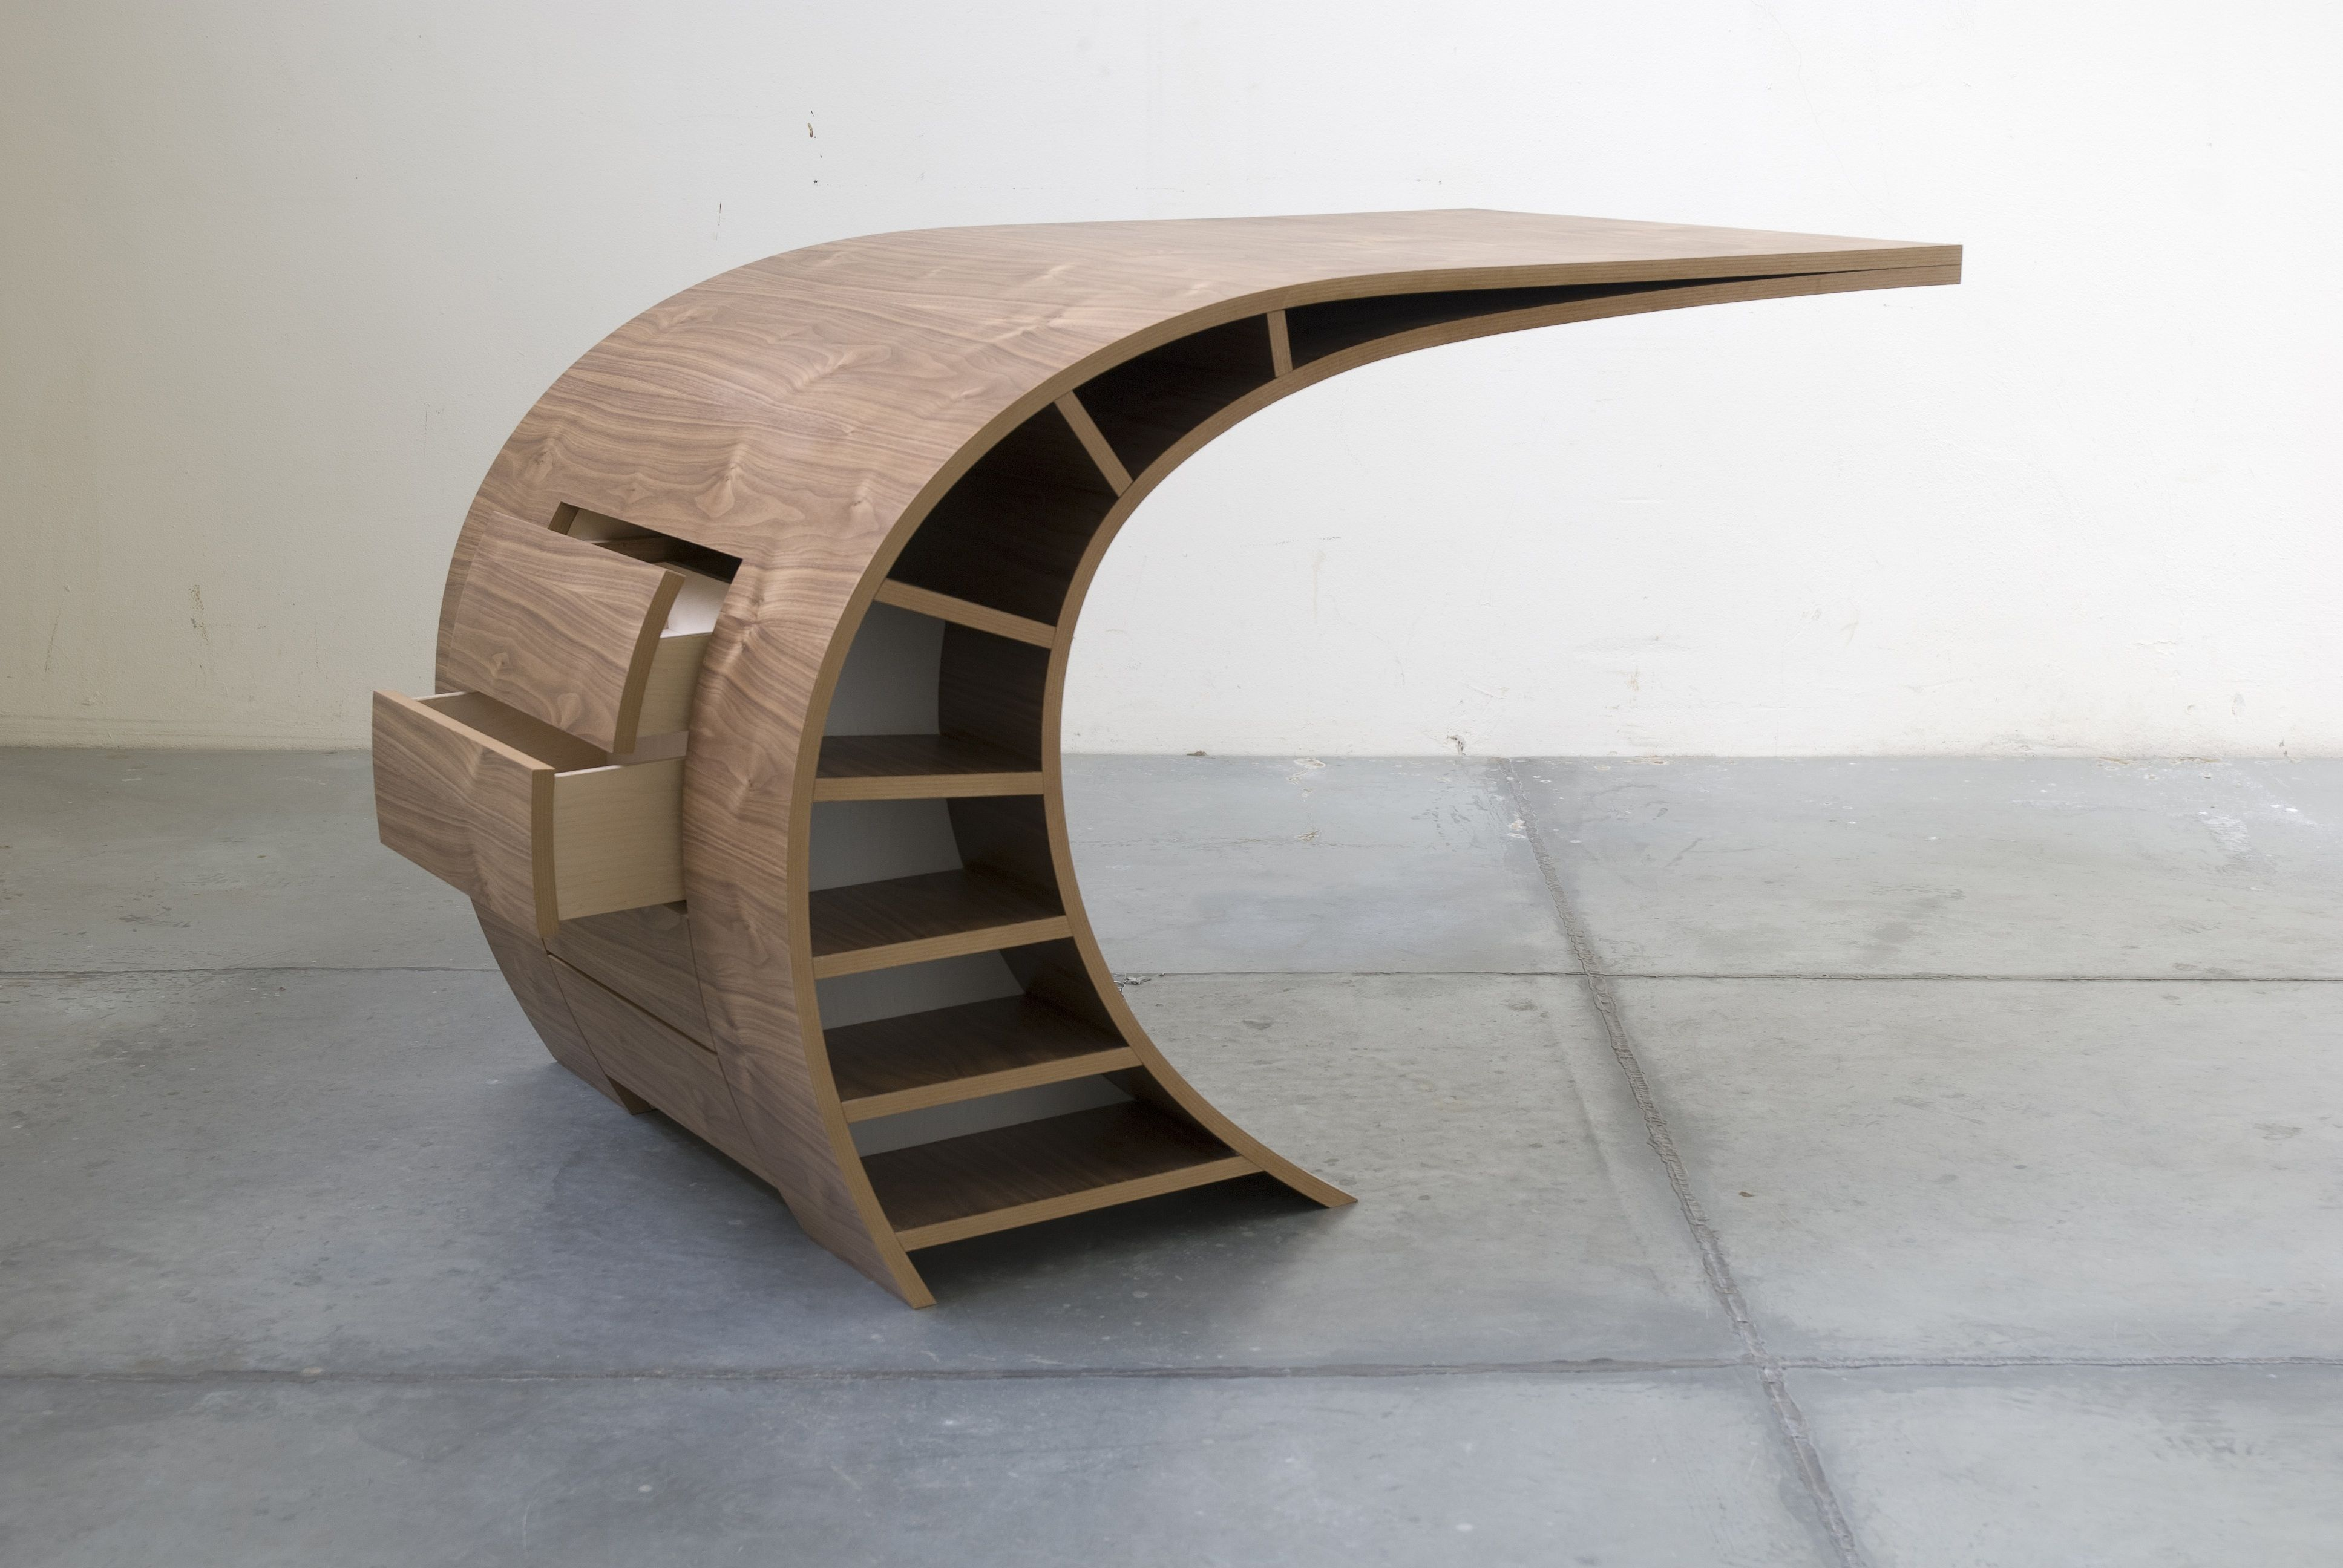 An Original And Dynamic Desk By Dutch Furniture Designer Jan